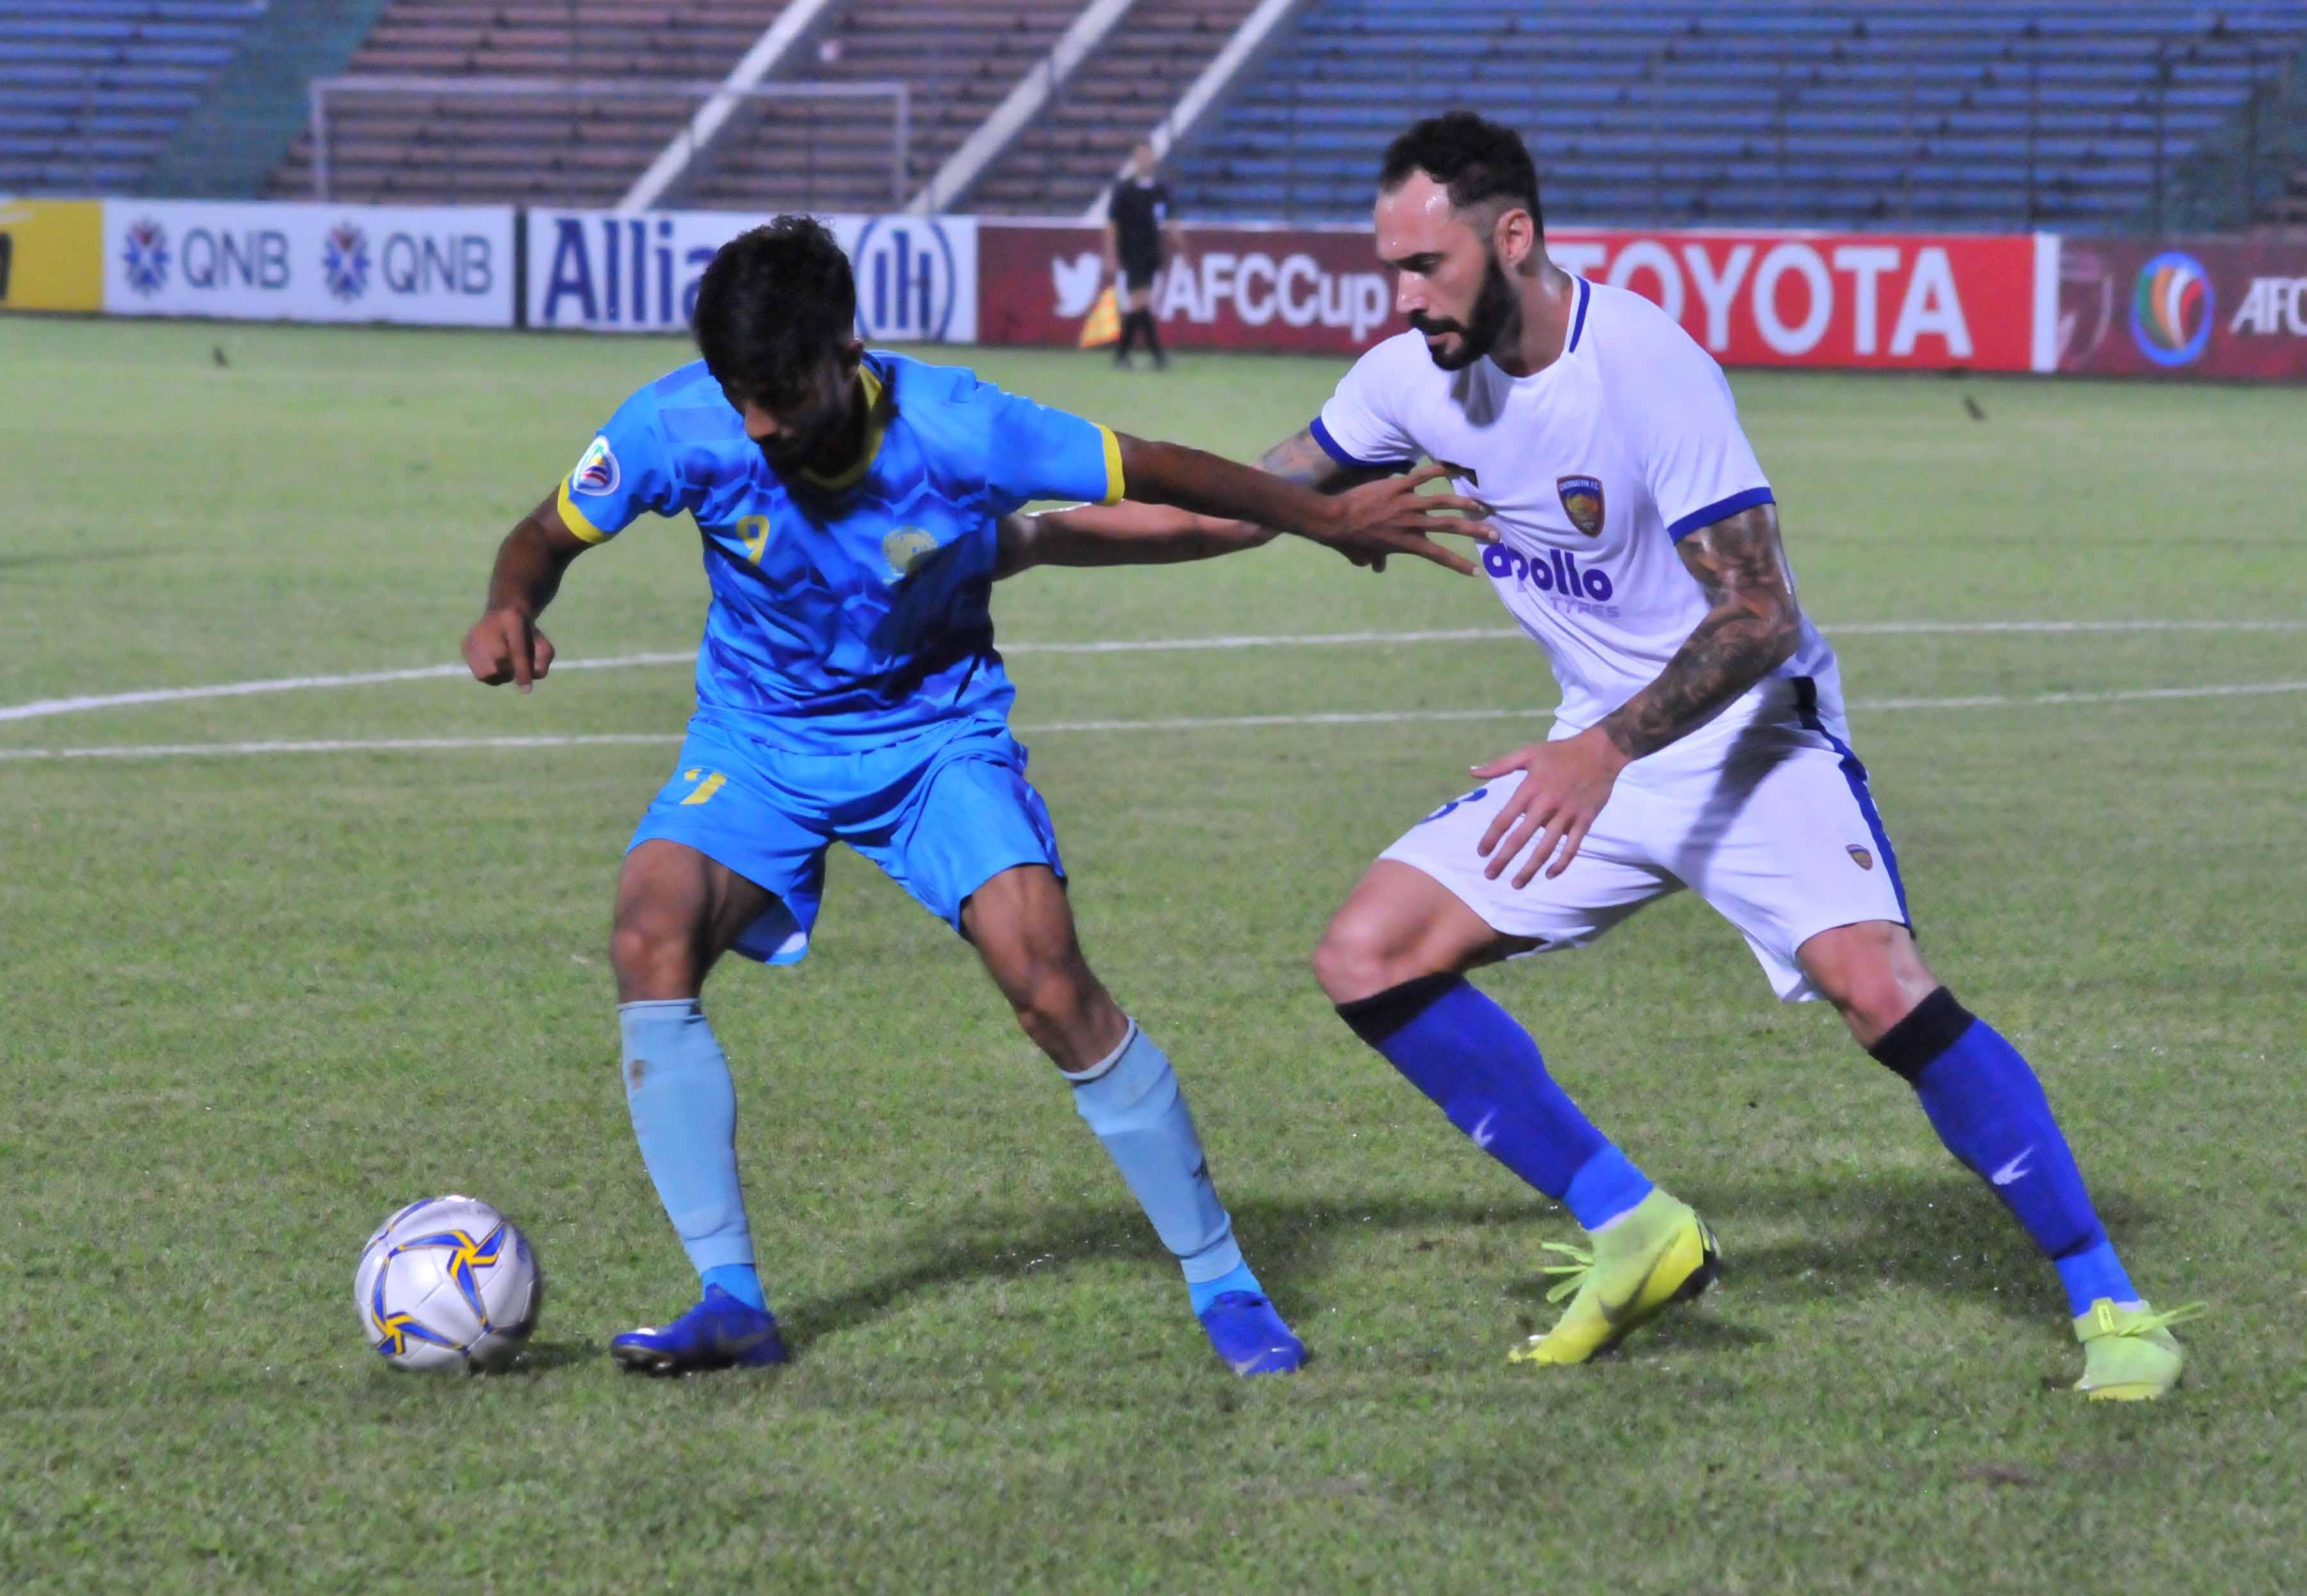 Eli Sabia Mohammad Nabib Dhaka Abahani Chennaiyin FC AFC Cup 2019